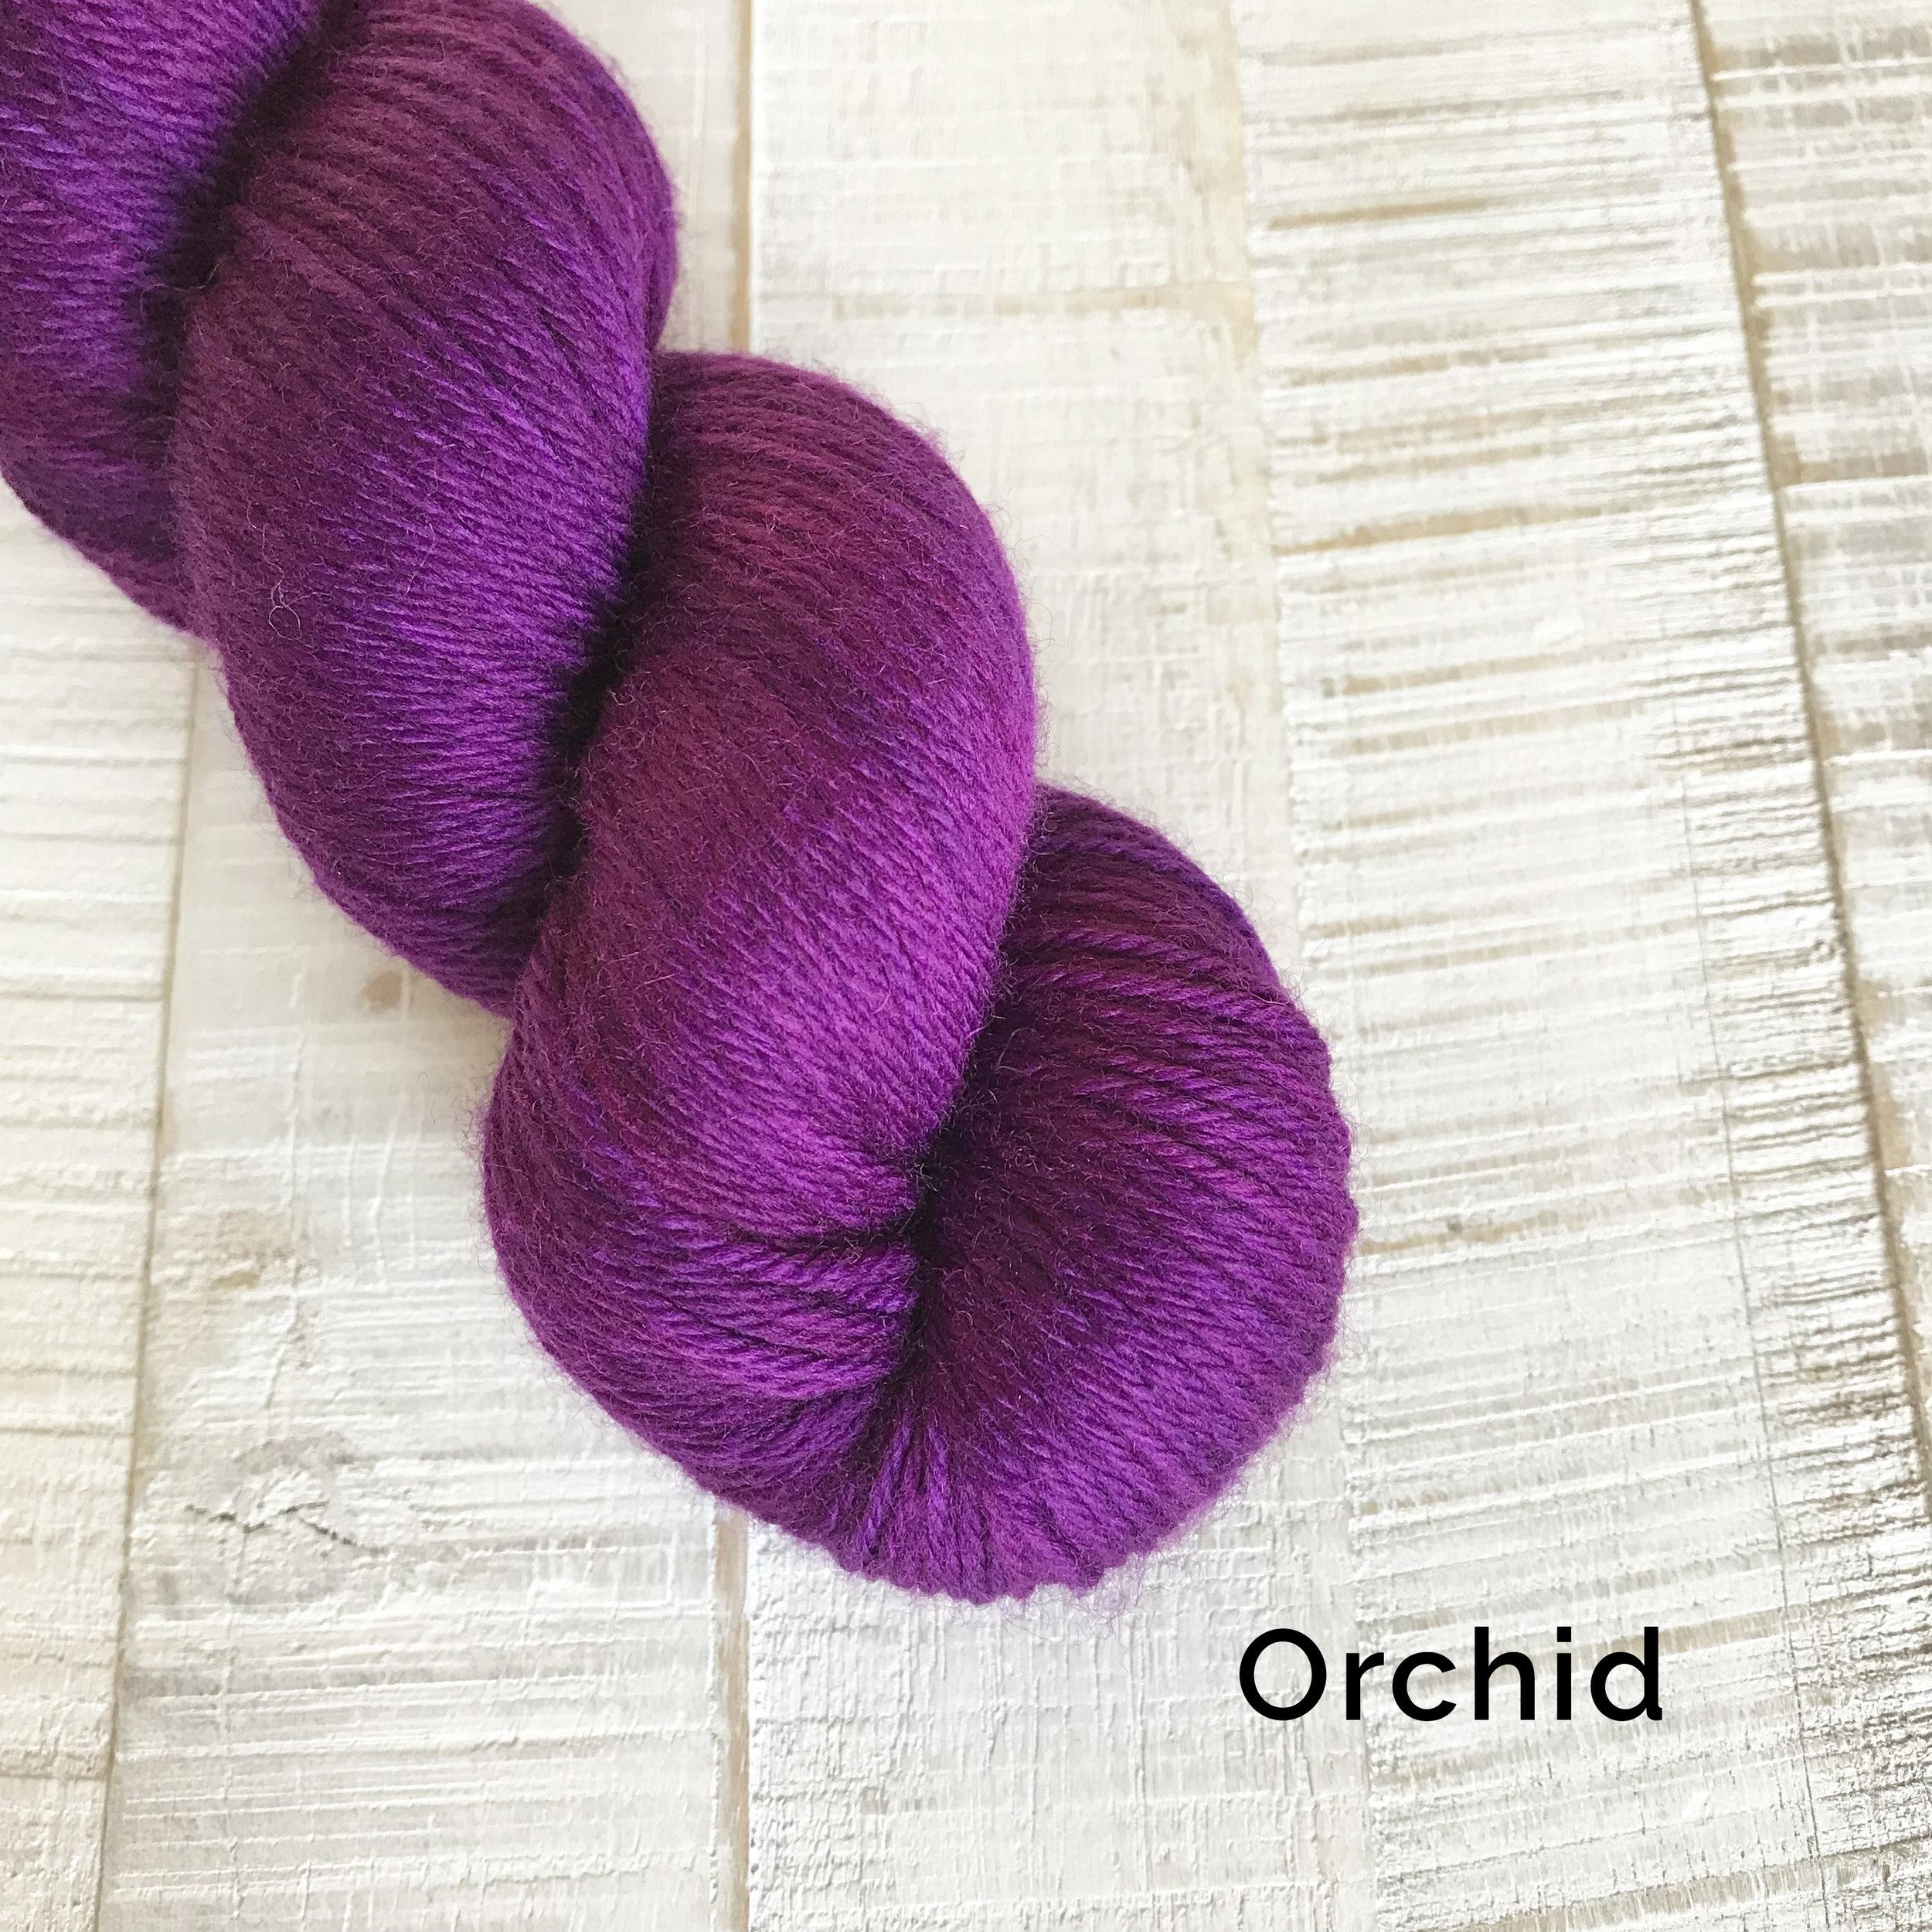 Orchid_all.jpg